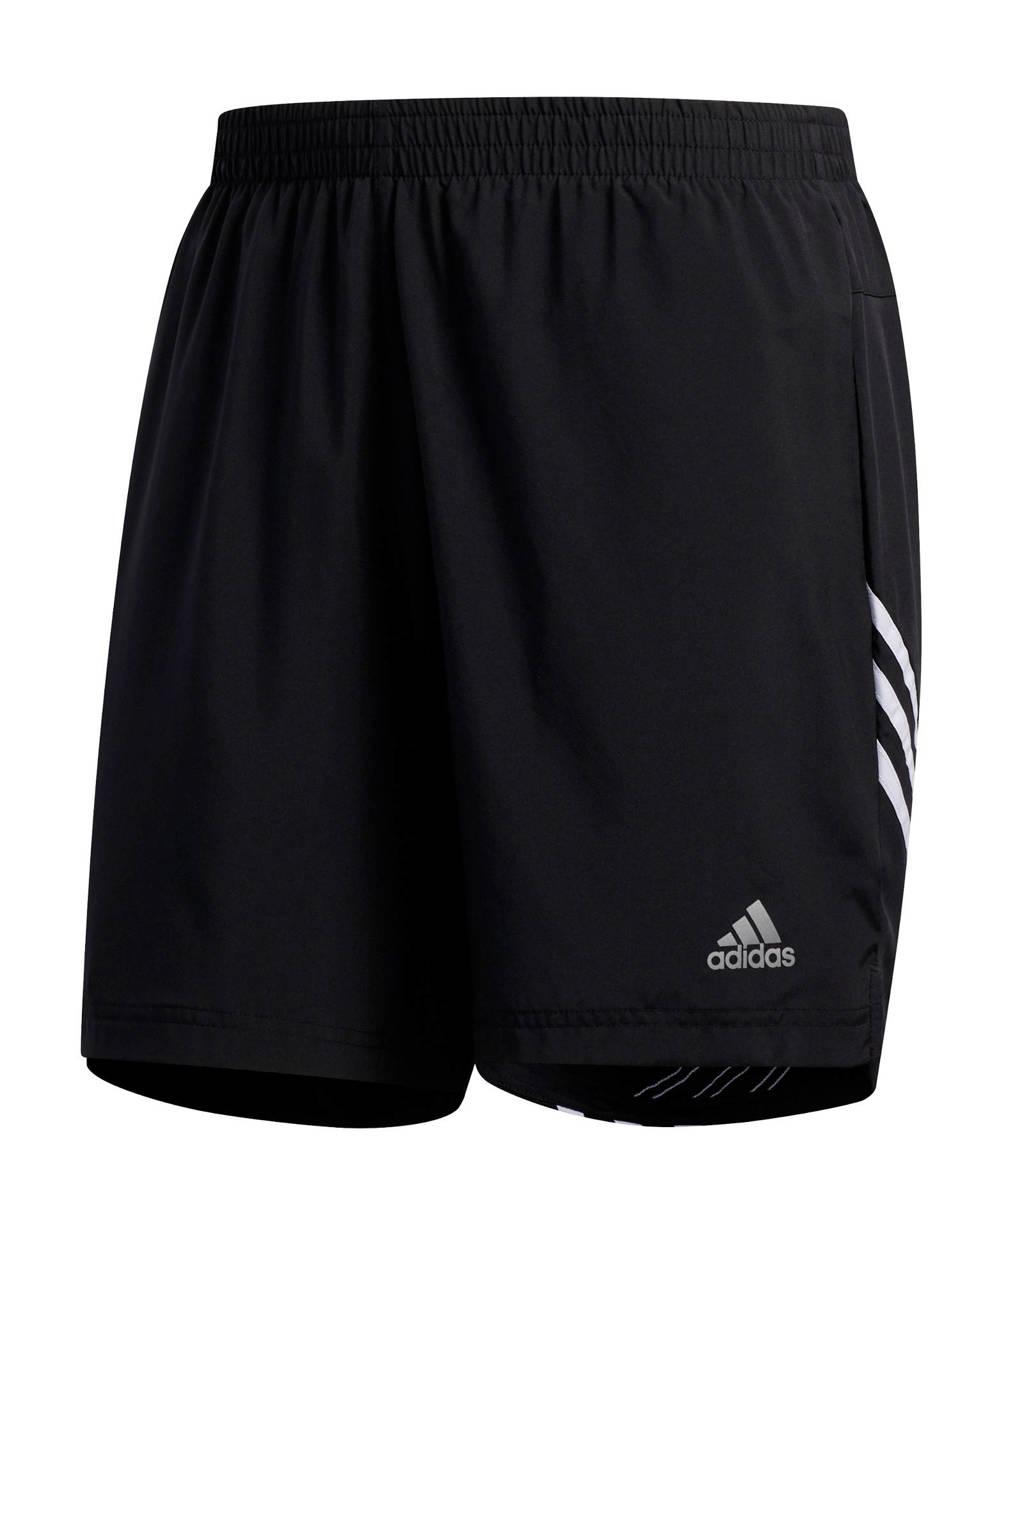 adidas Performance   hardloop short zwart, Zwart